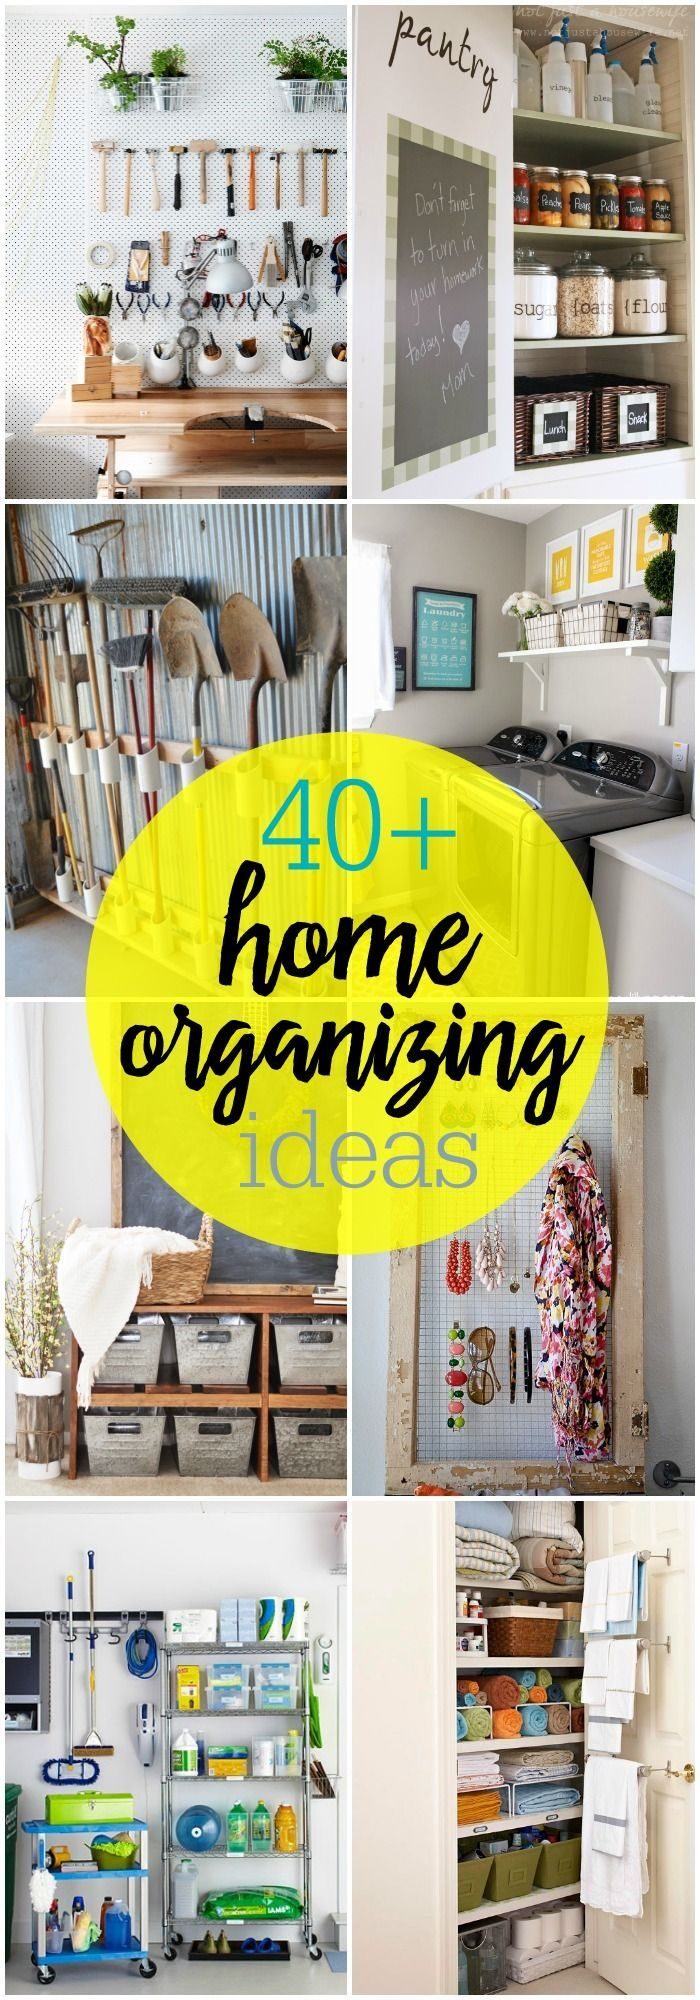 508 best organize images on Pinterest | Home ideas, Organizing ideas ...